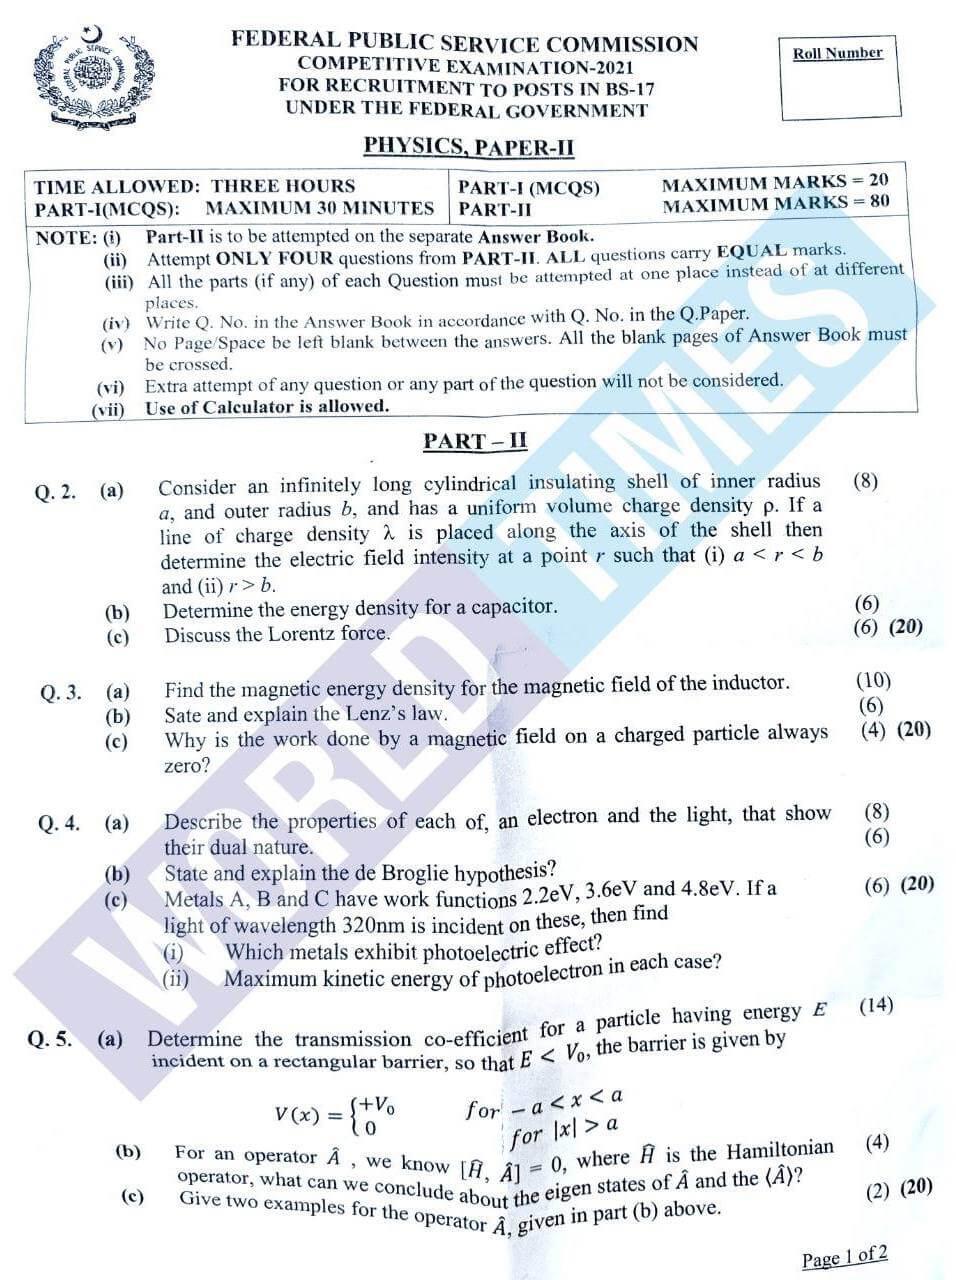 CSS Physics Paper-II 2021-1